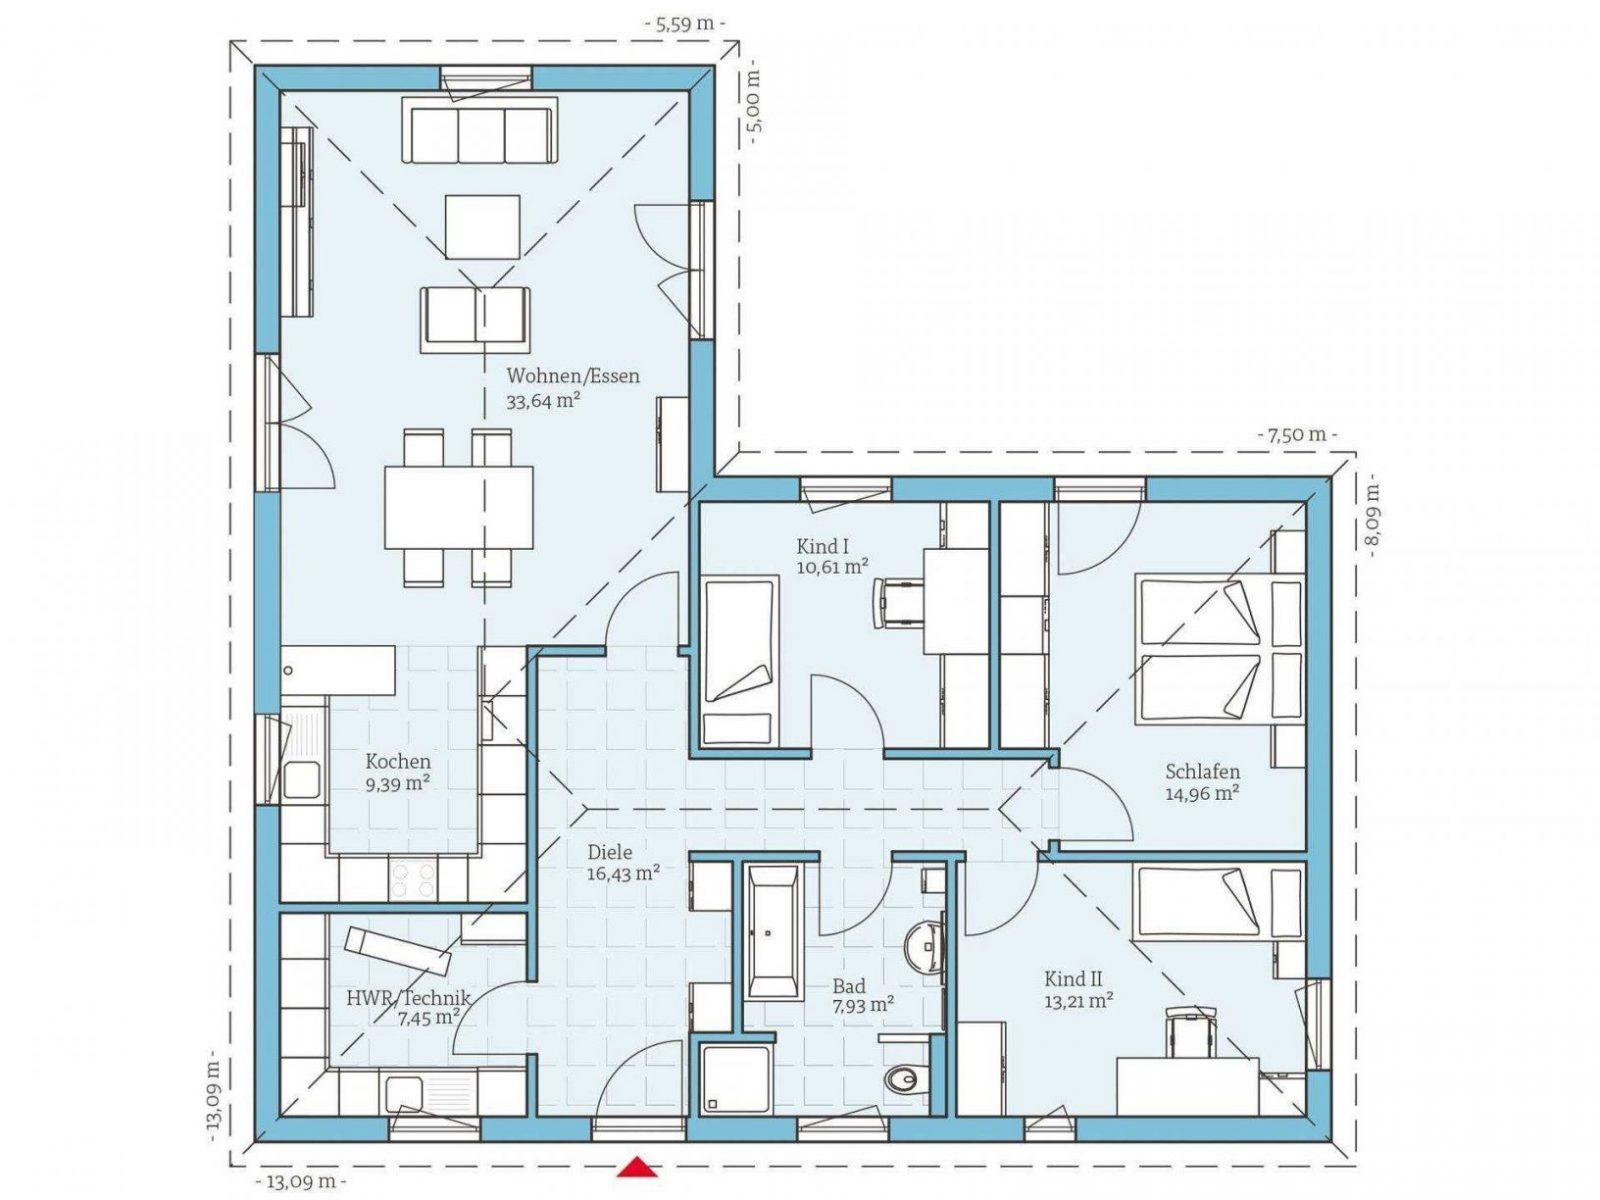 bungalow bauen anbieter preise grundrisse im berblick von bungalow l form grundriss photo. Black Bedroom Furniture Sets. Home Design Ideas